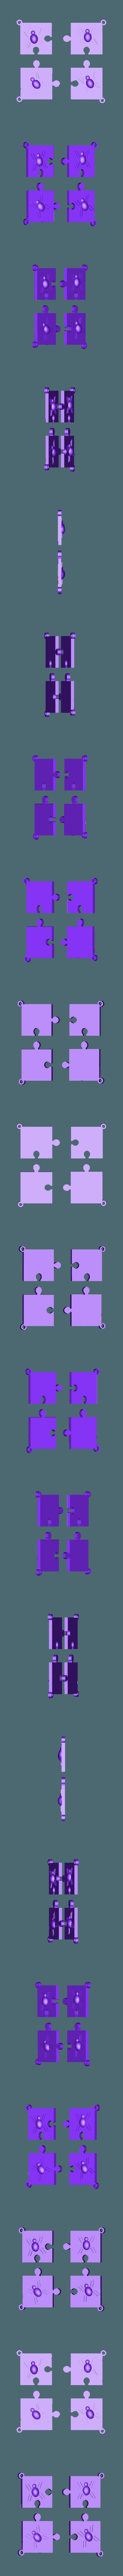 puzzle araignées.stl Download STL file puzzle key ring • 3D printing design, catf3d